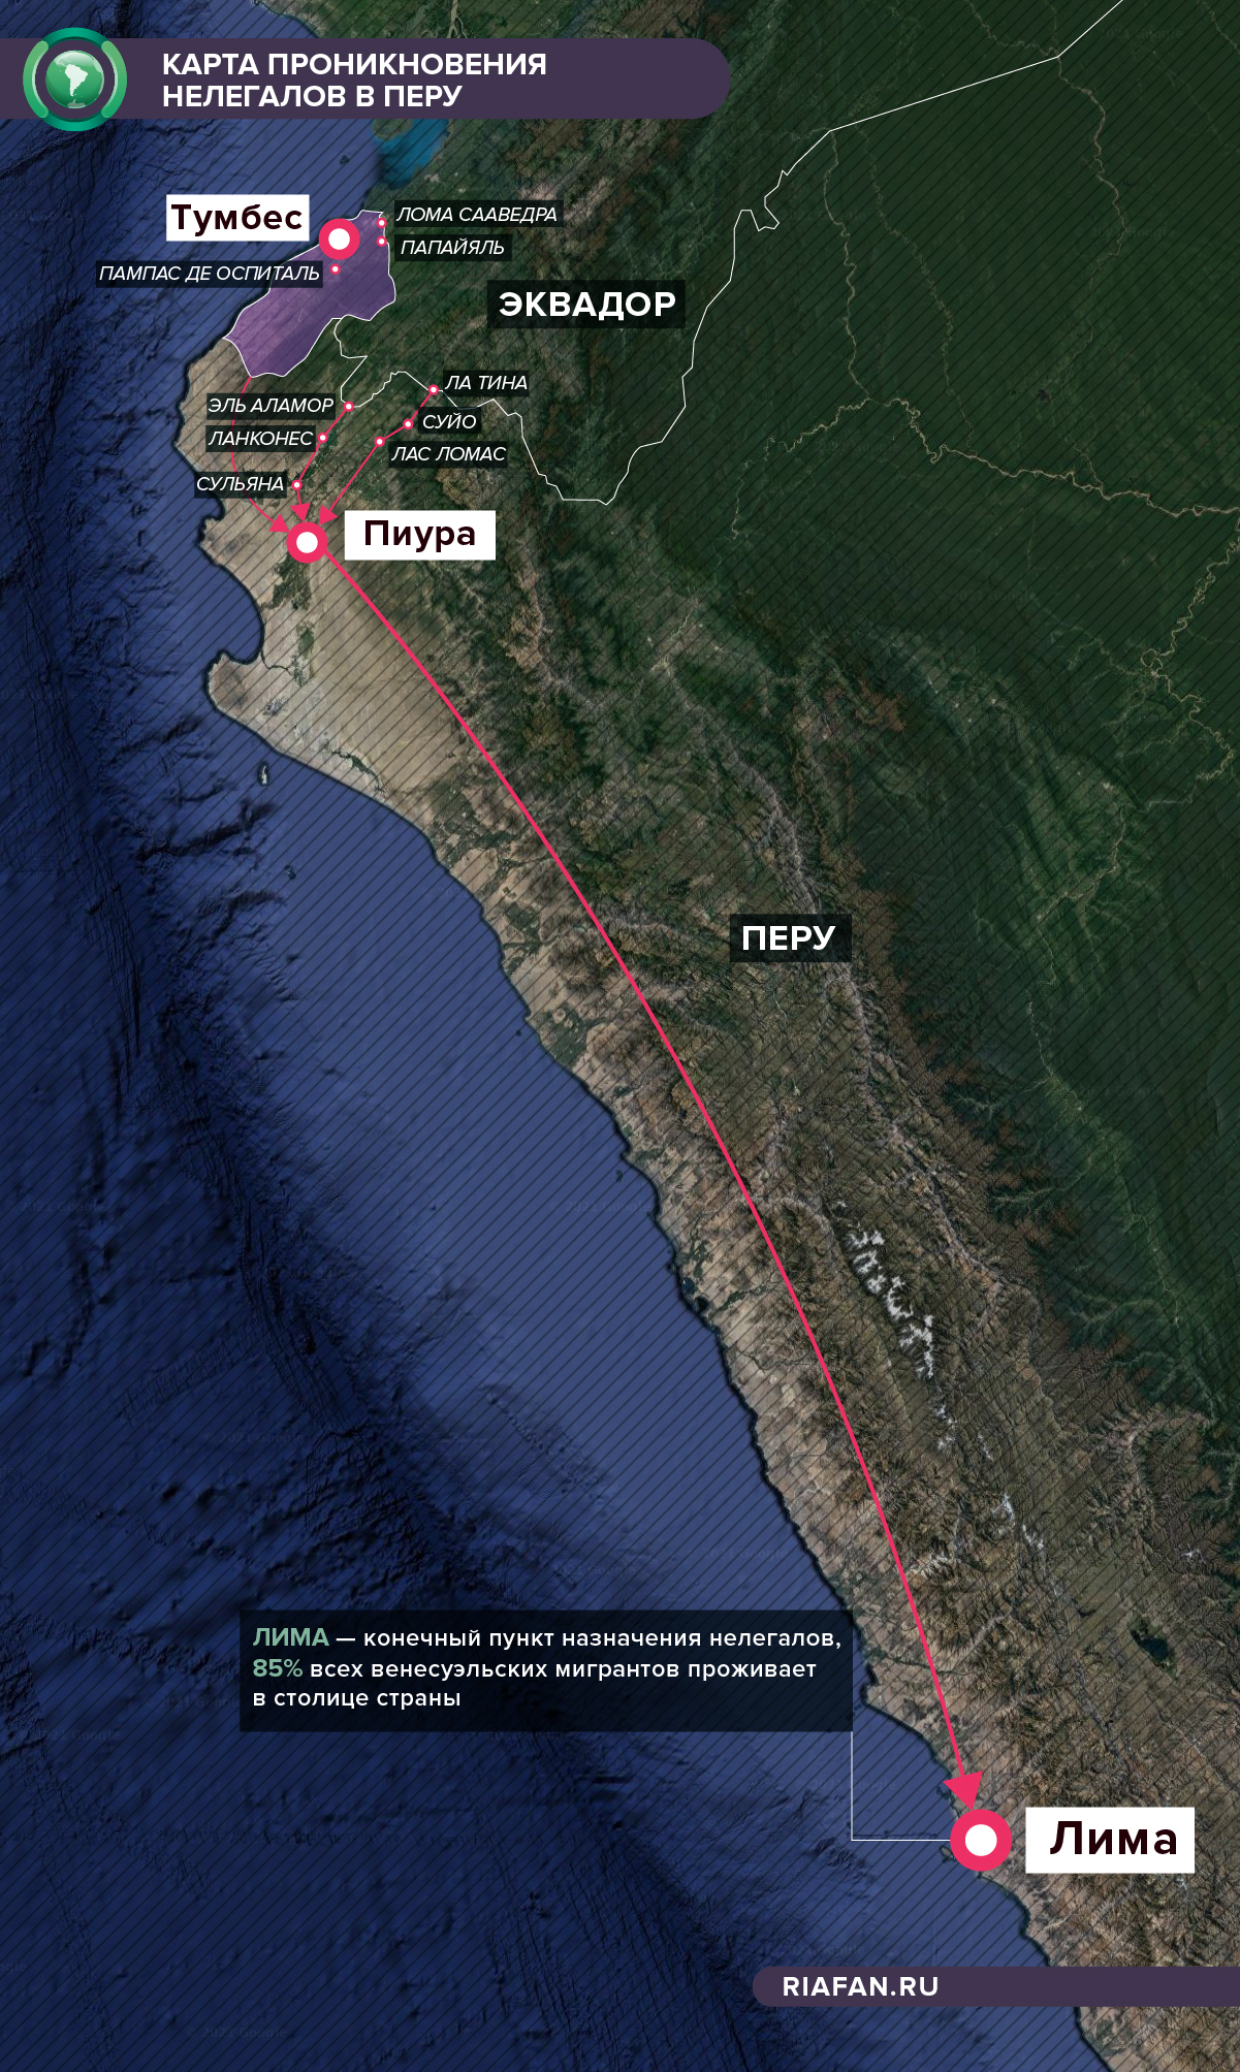 Карта маршрутов проникновения нелегалов в Перу